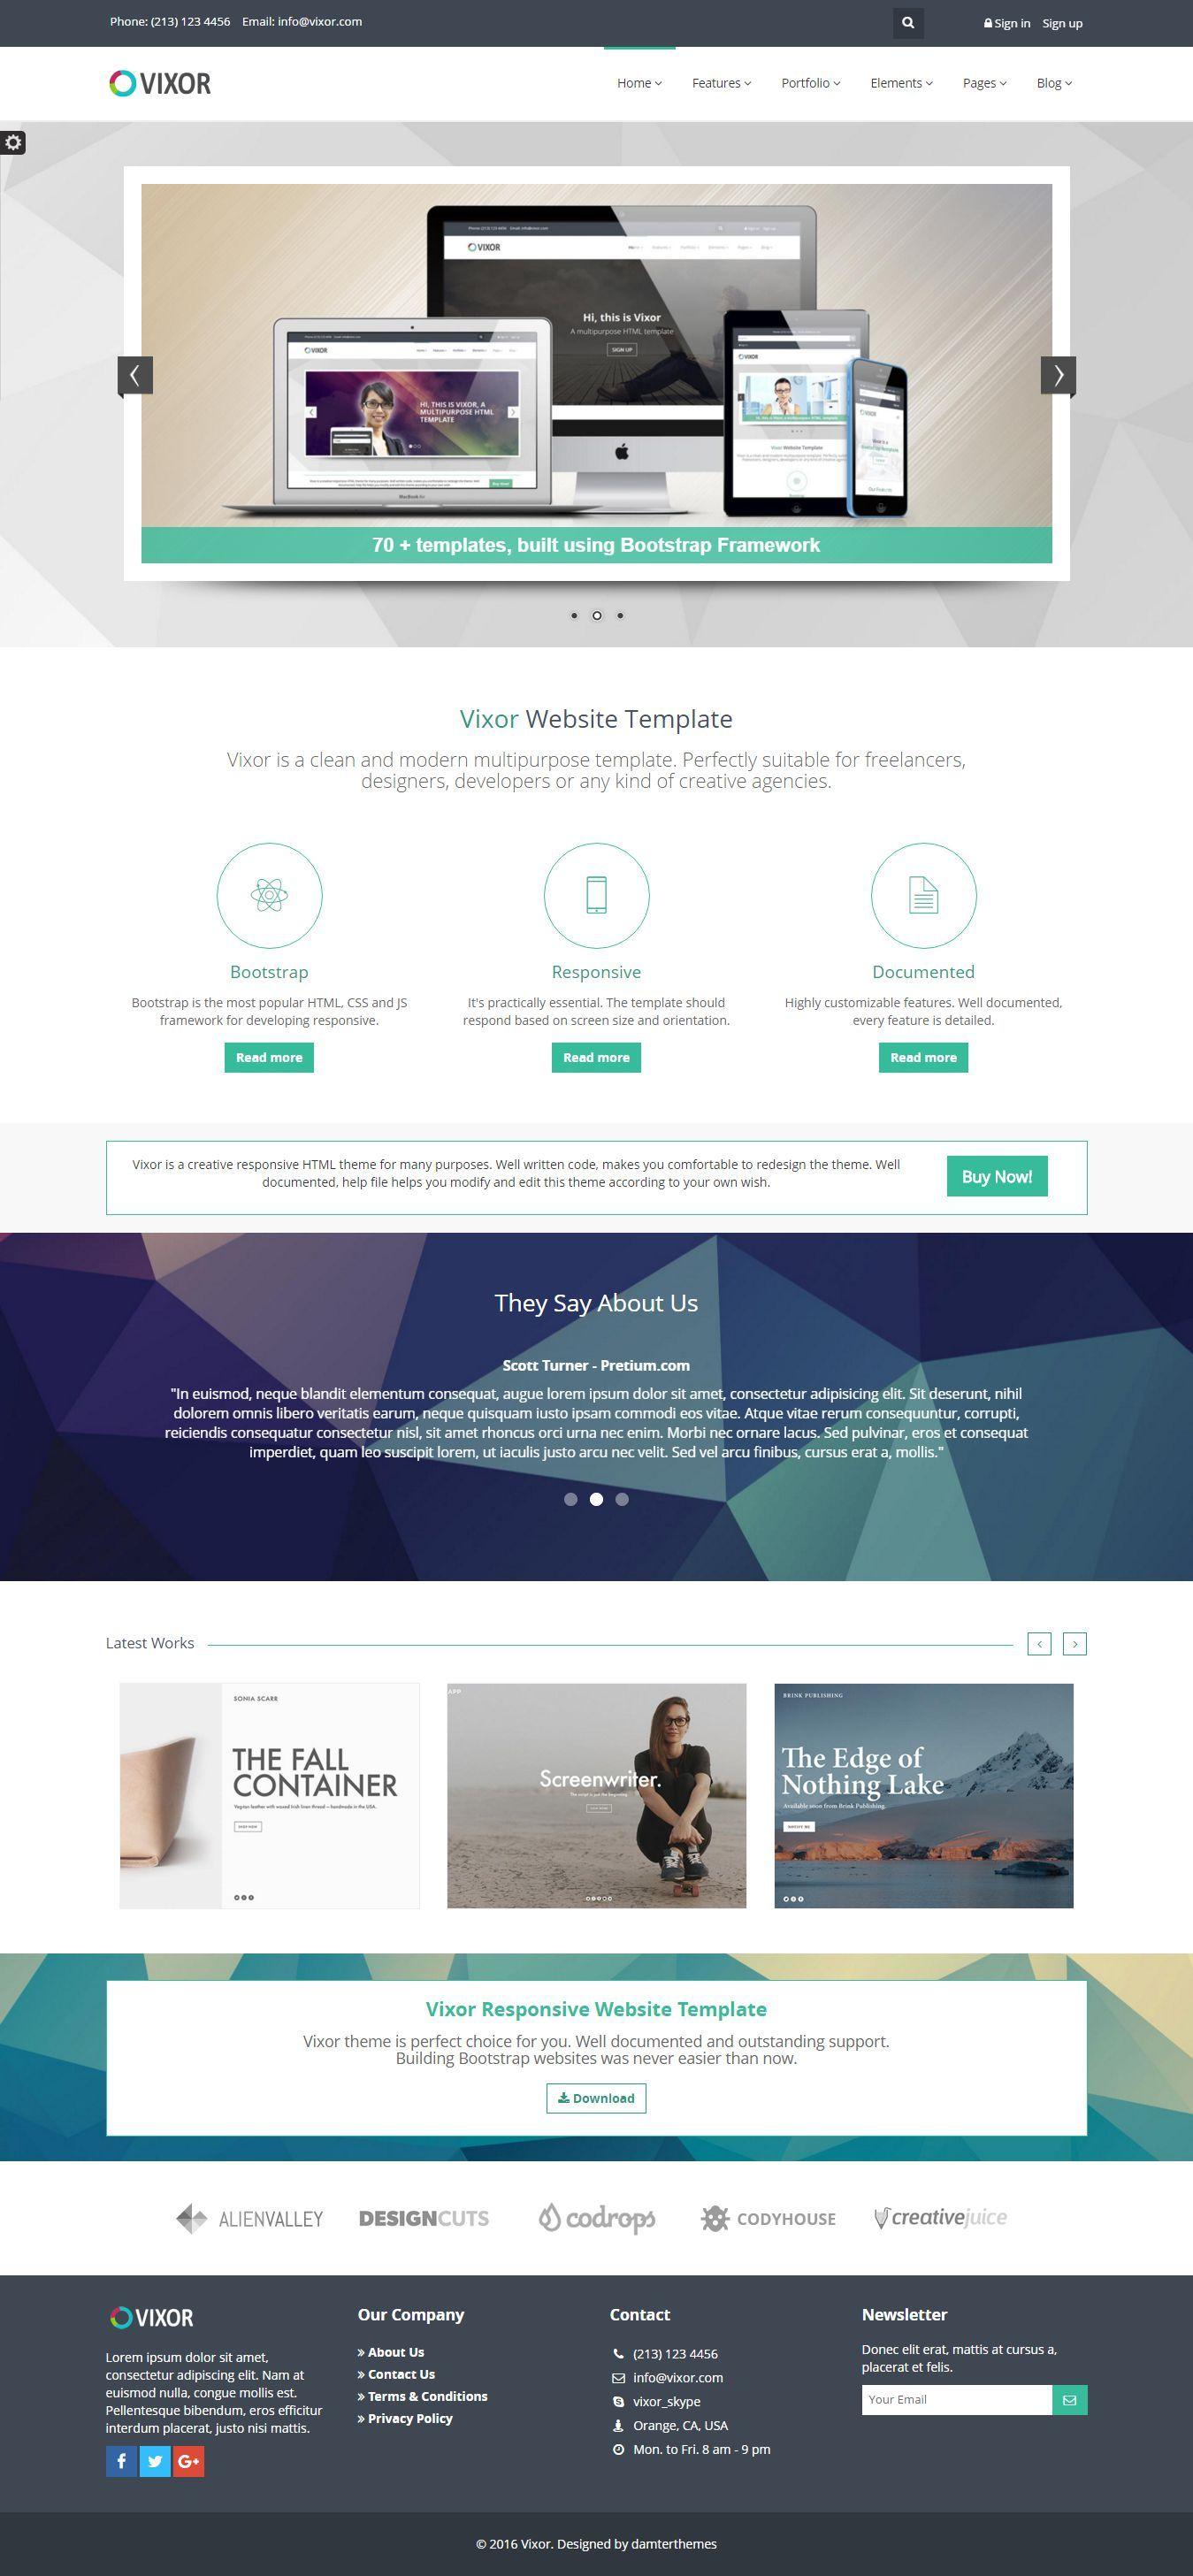 Vixor Beautiful Responsive Website Template with 70+ homepage ...